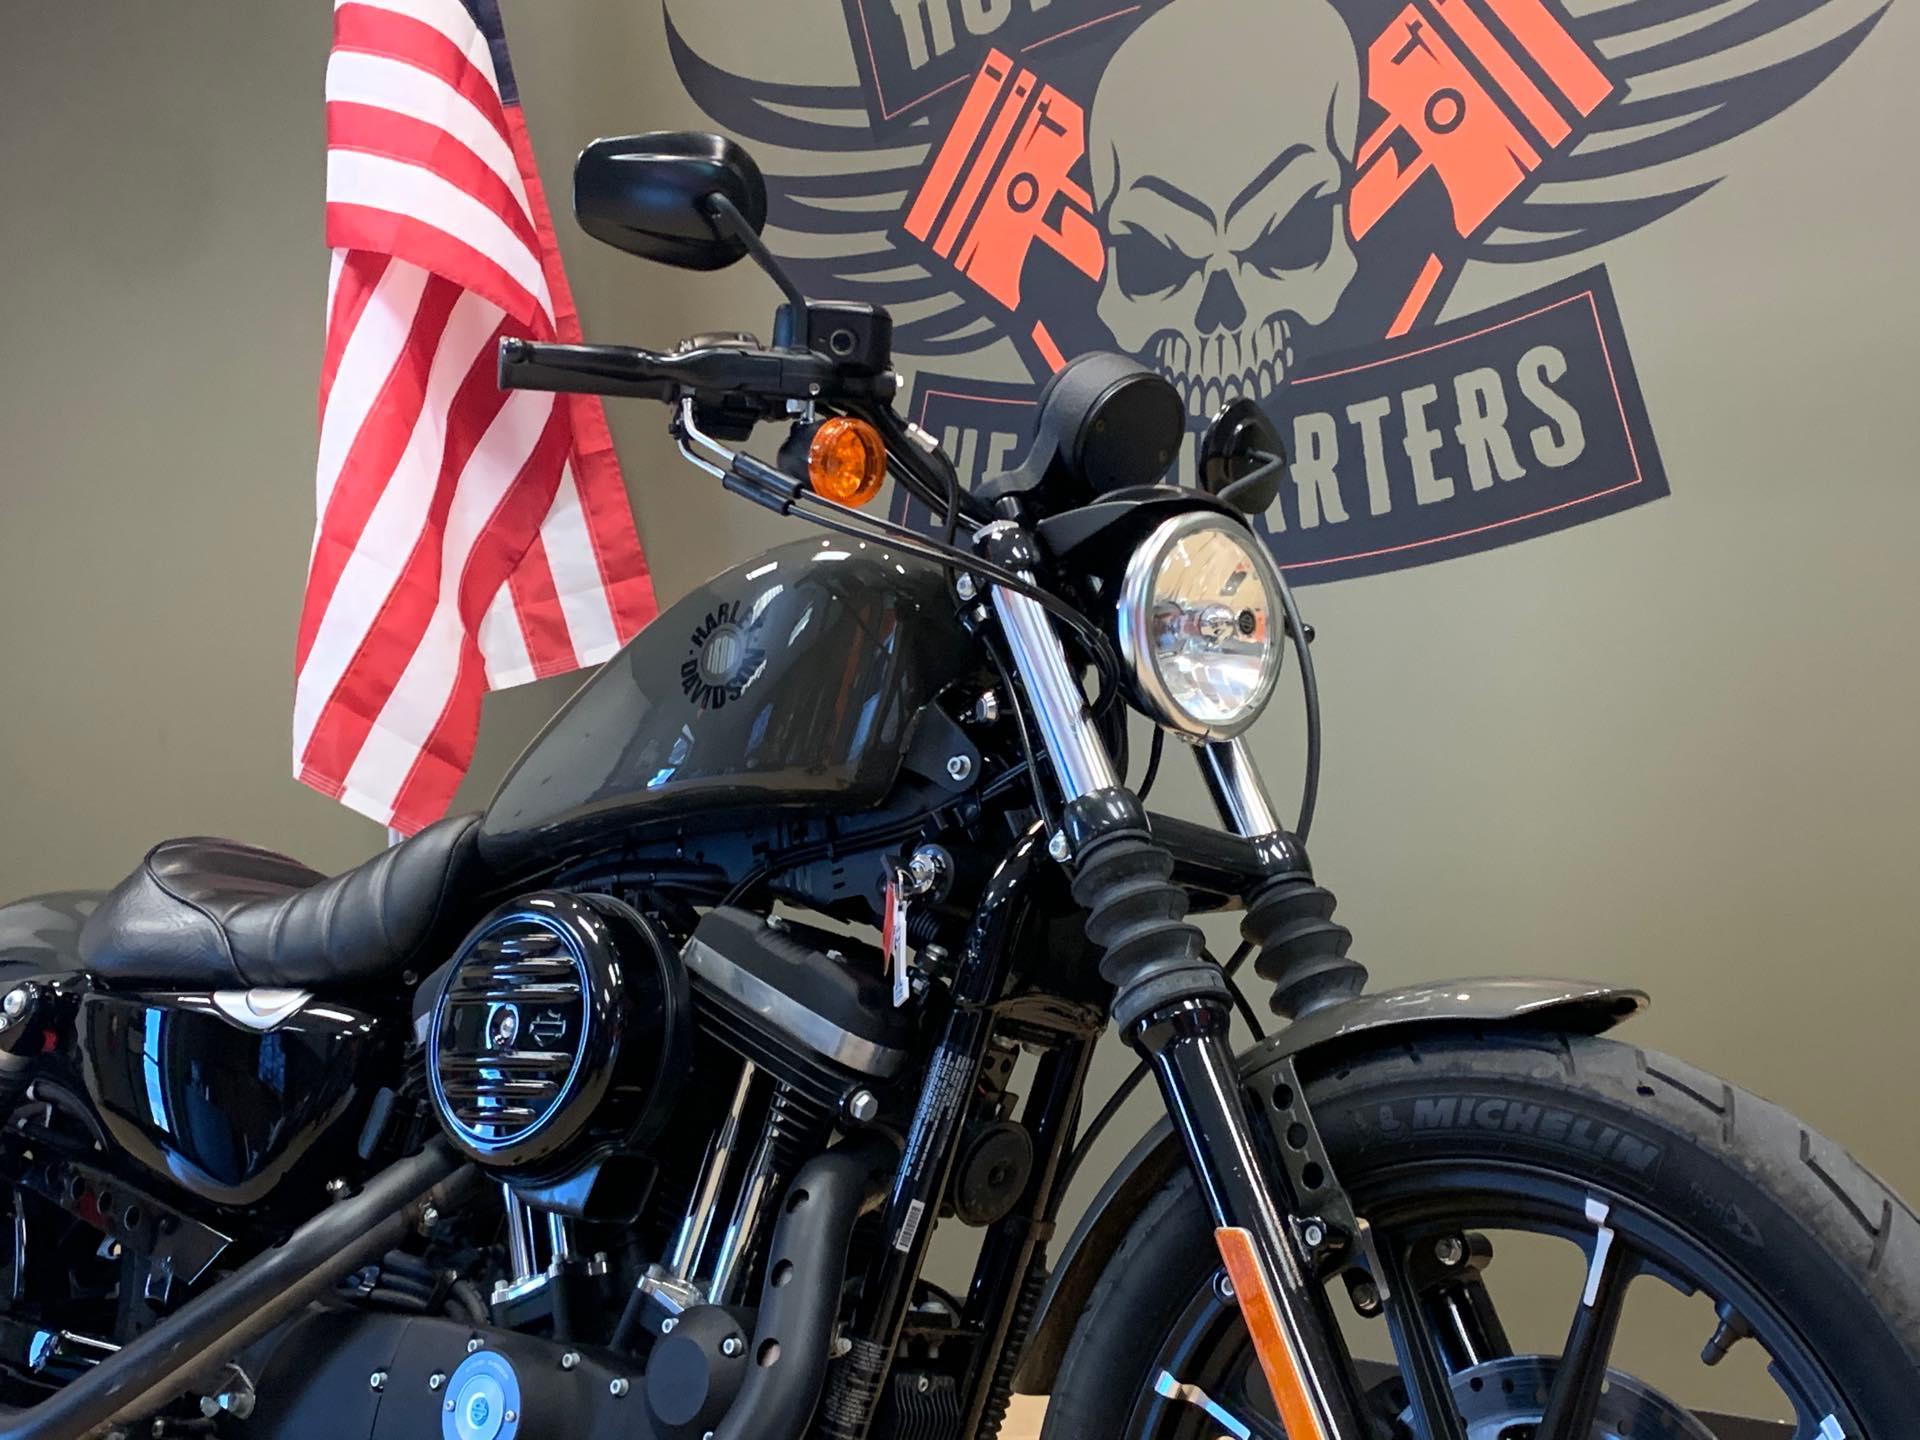 2019 Harley-Davidson Sportster Iron 883 at Loess Hills Harley-Davidson